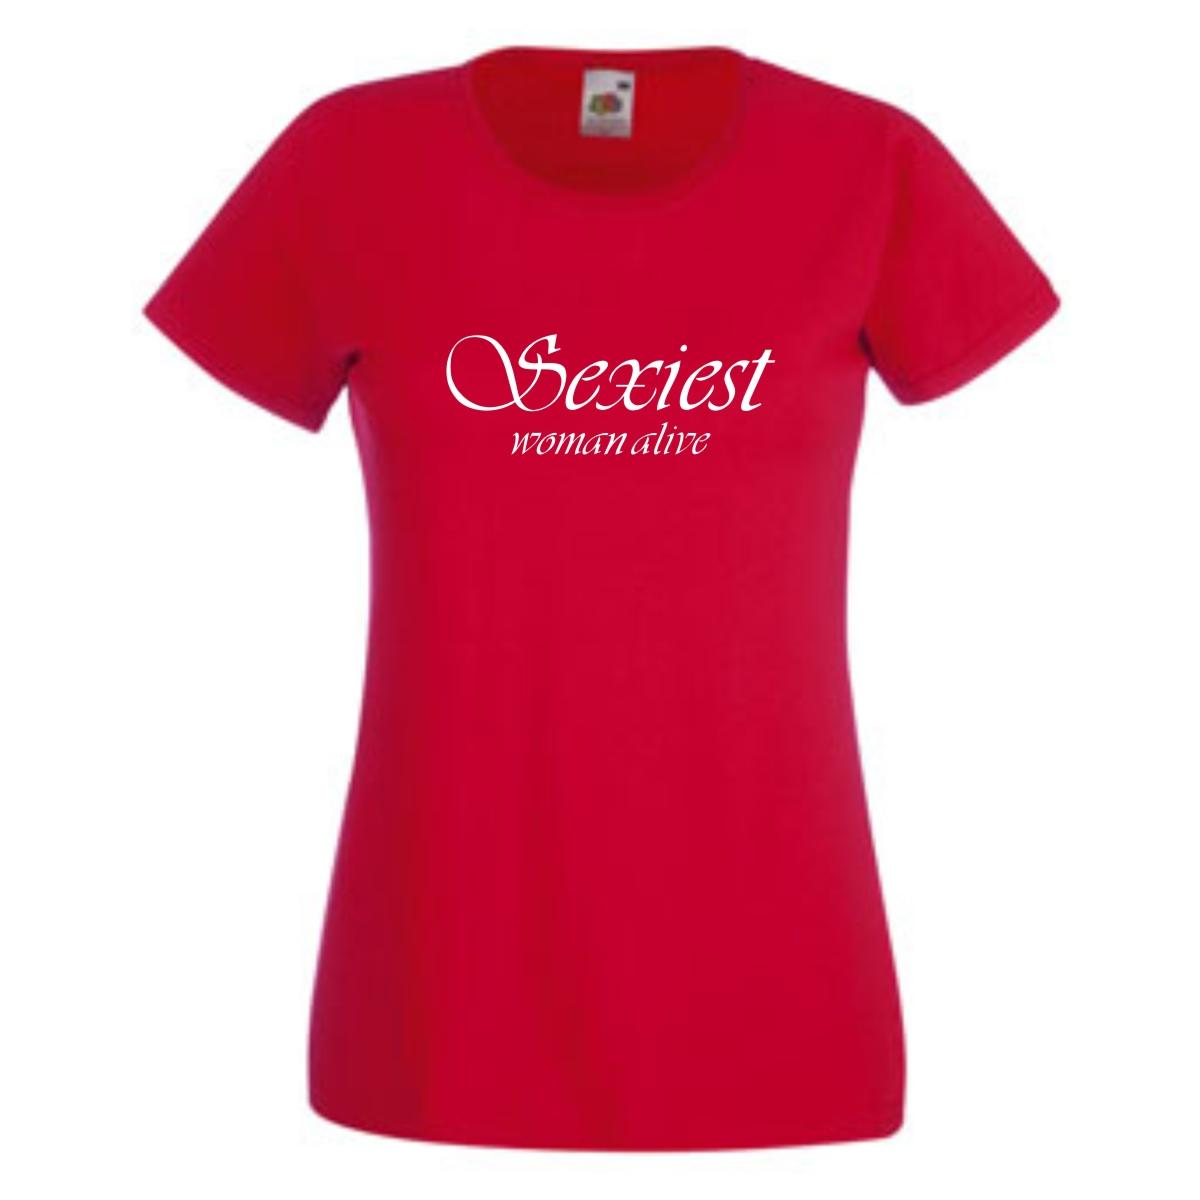 Sexiest woman alive spruche t shirt damen funshirt for Witzige t shirt sprüche